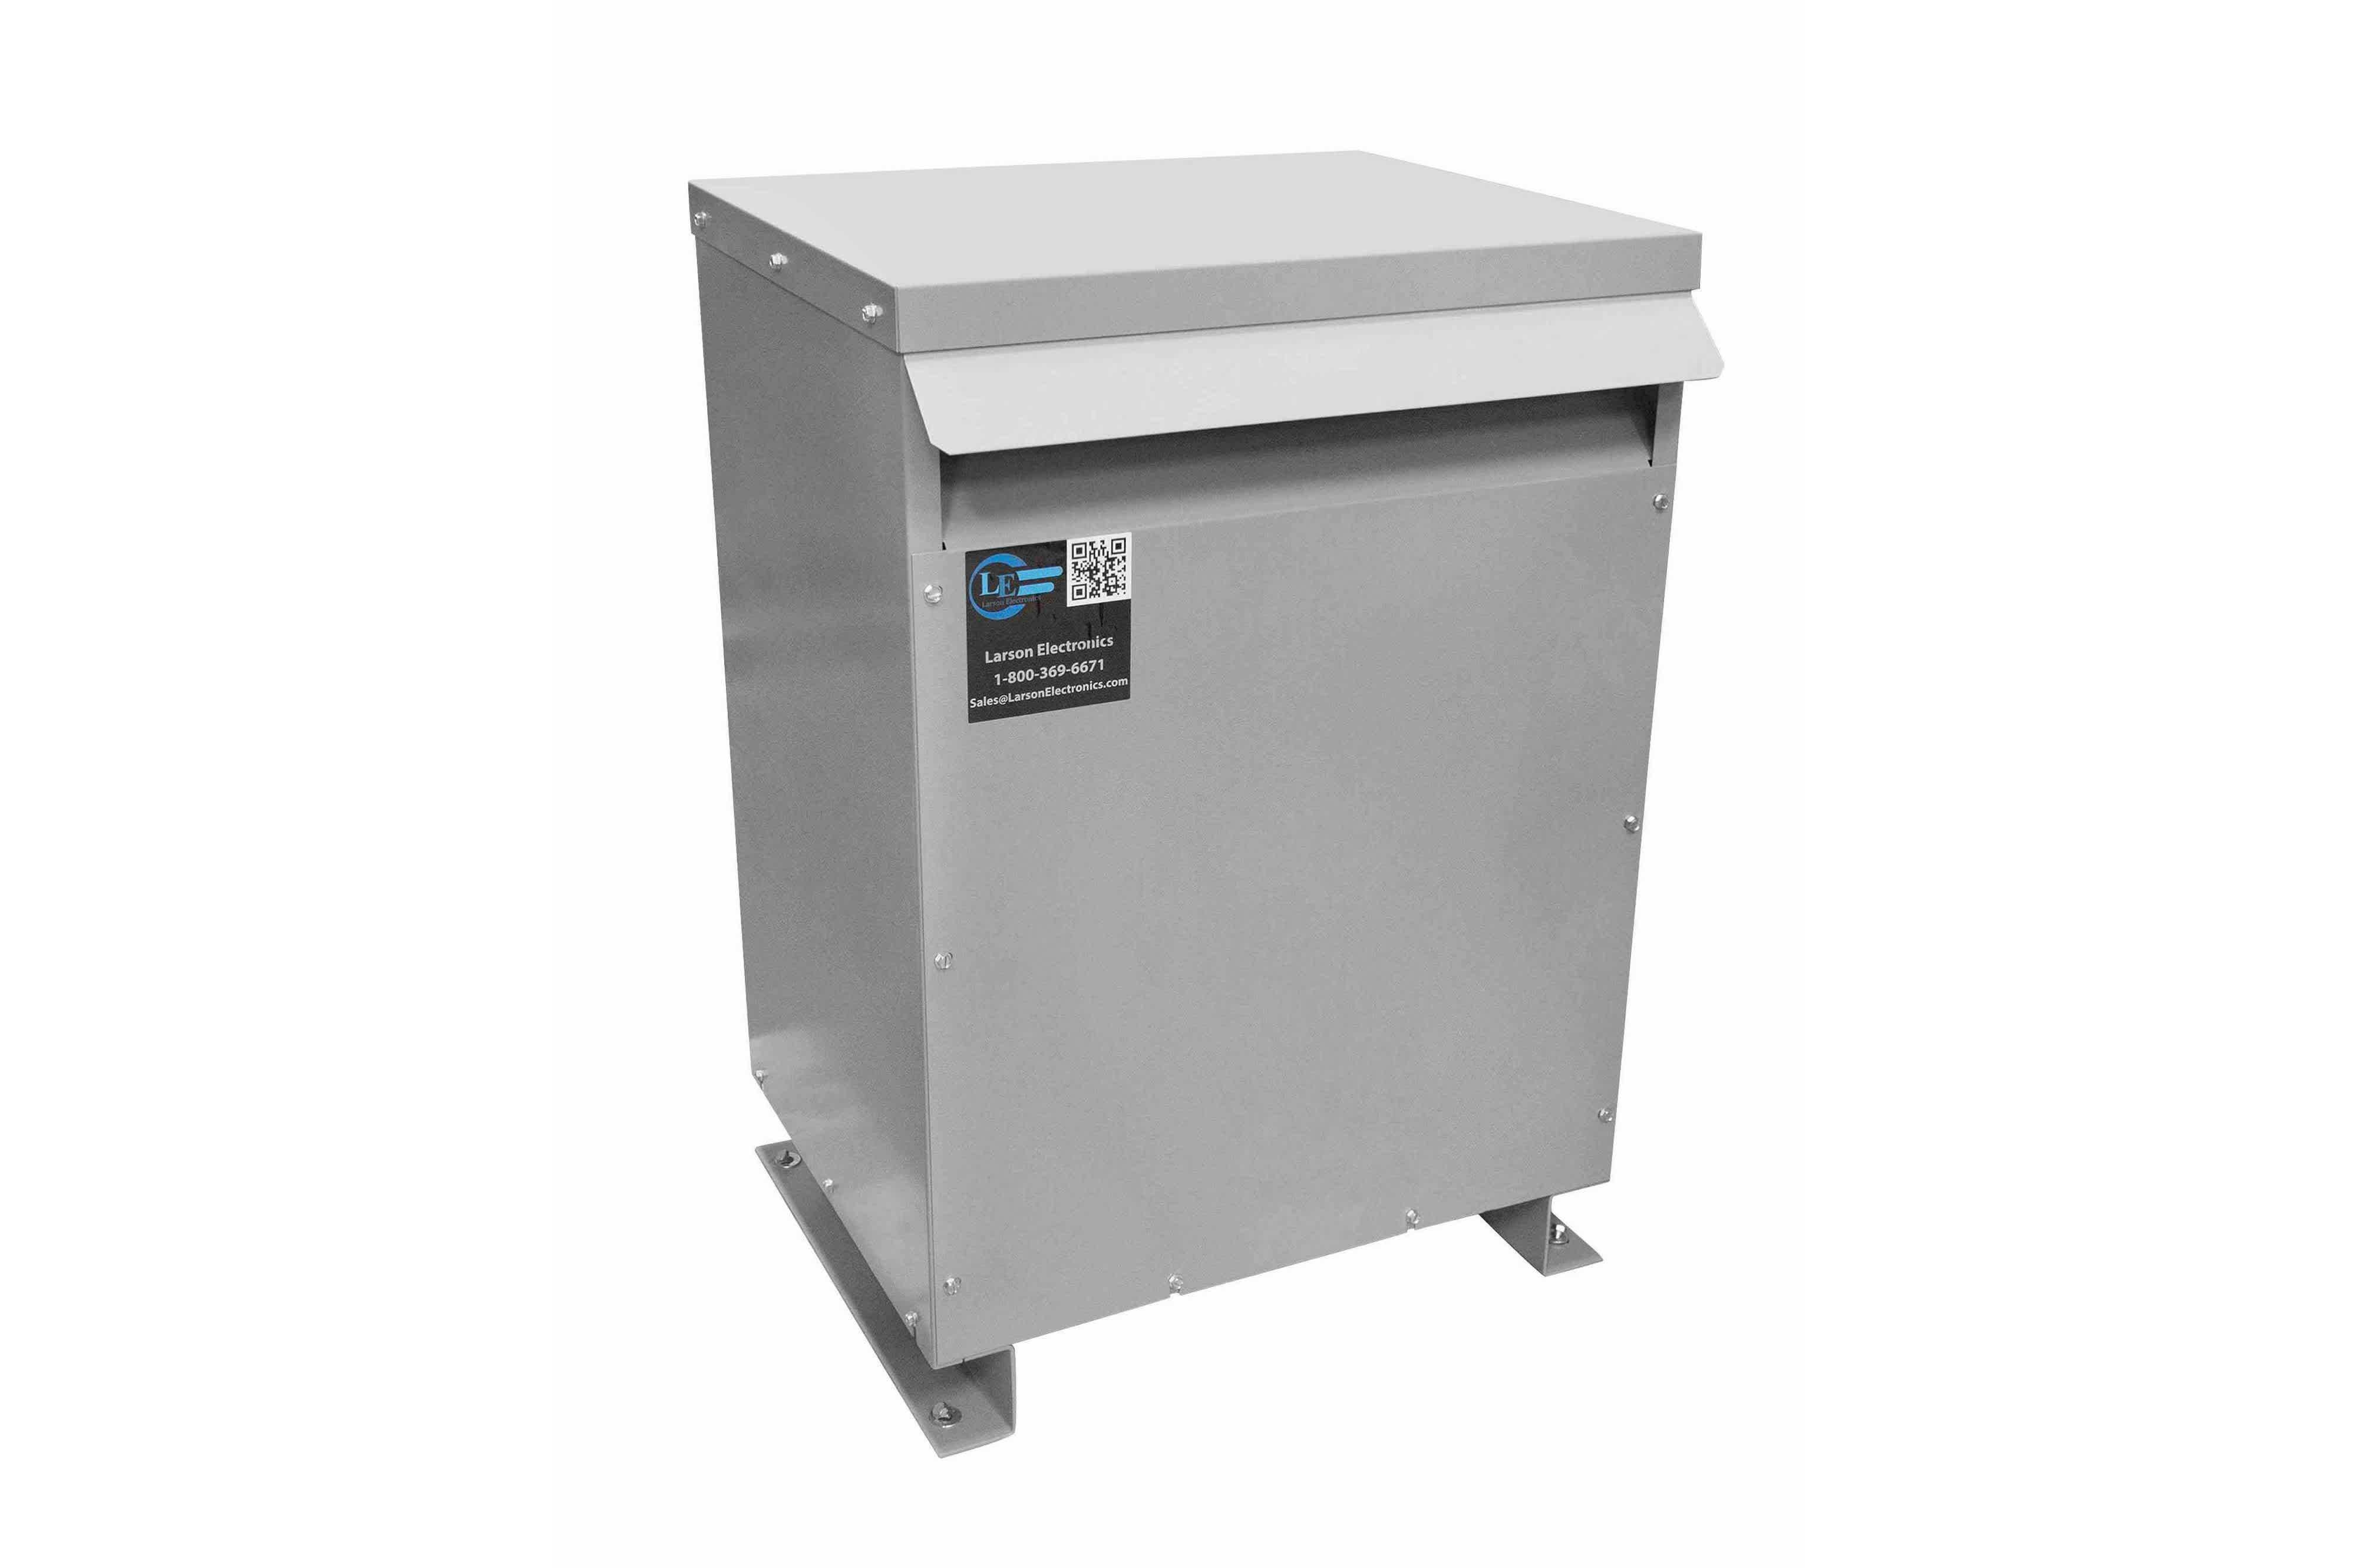 225 kVA 3PH Isolation Transformer, 220V Wye Primary, 208V Delta Secondary, N3R, Ventilated, 60 Hz